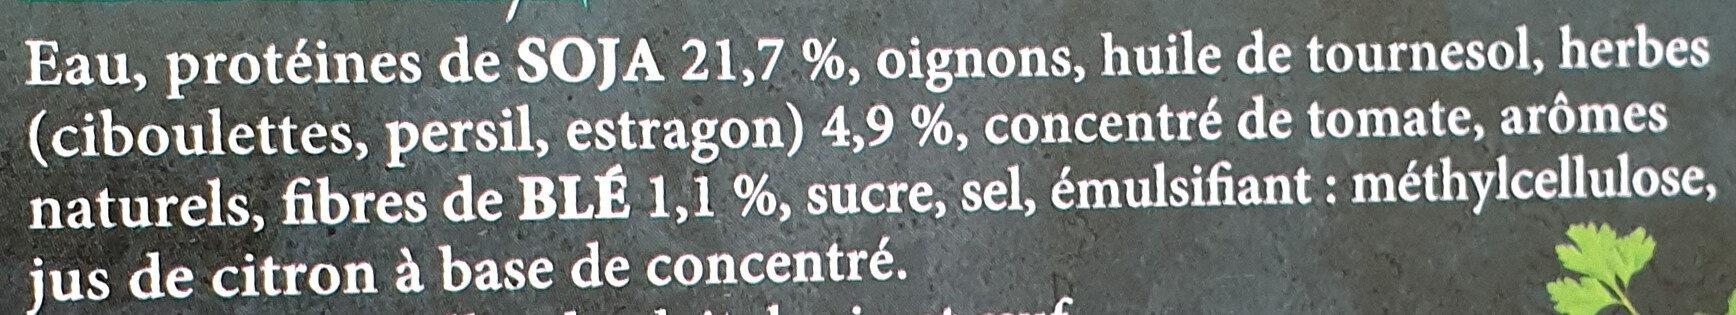 Steaks de soja fines herbes - Ingrédients - fr